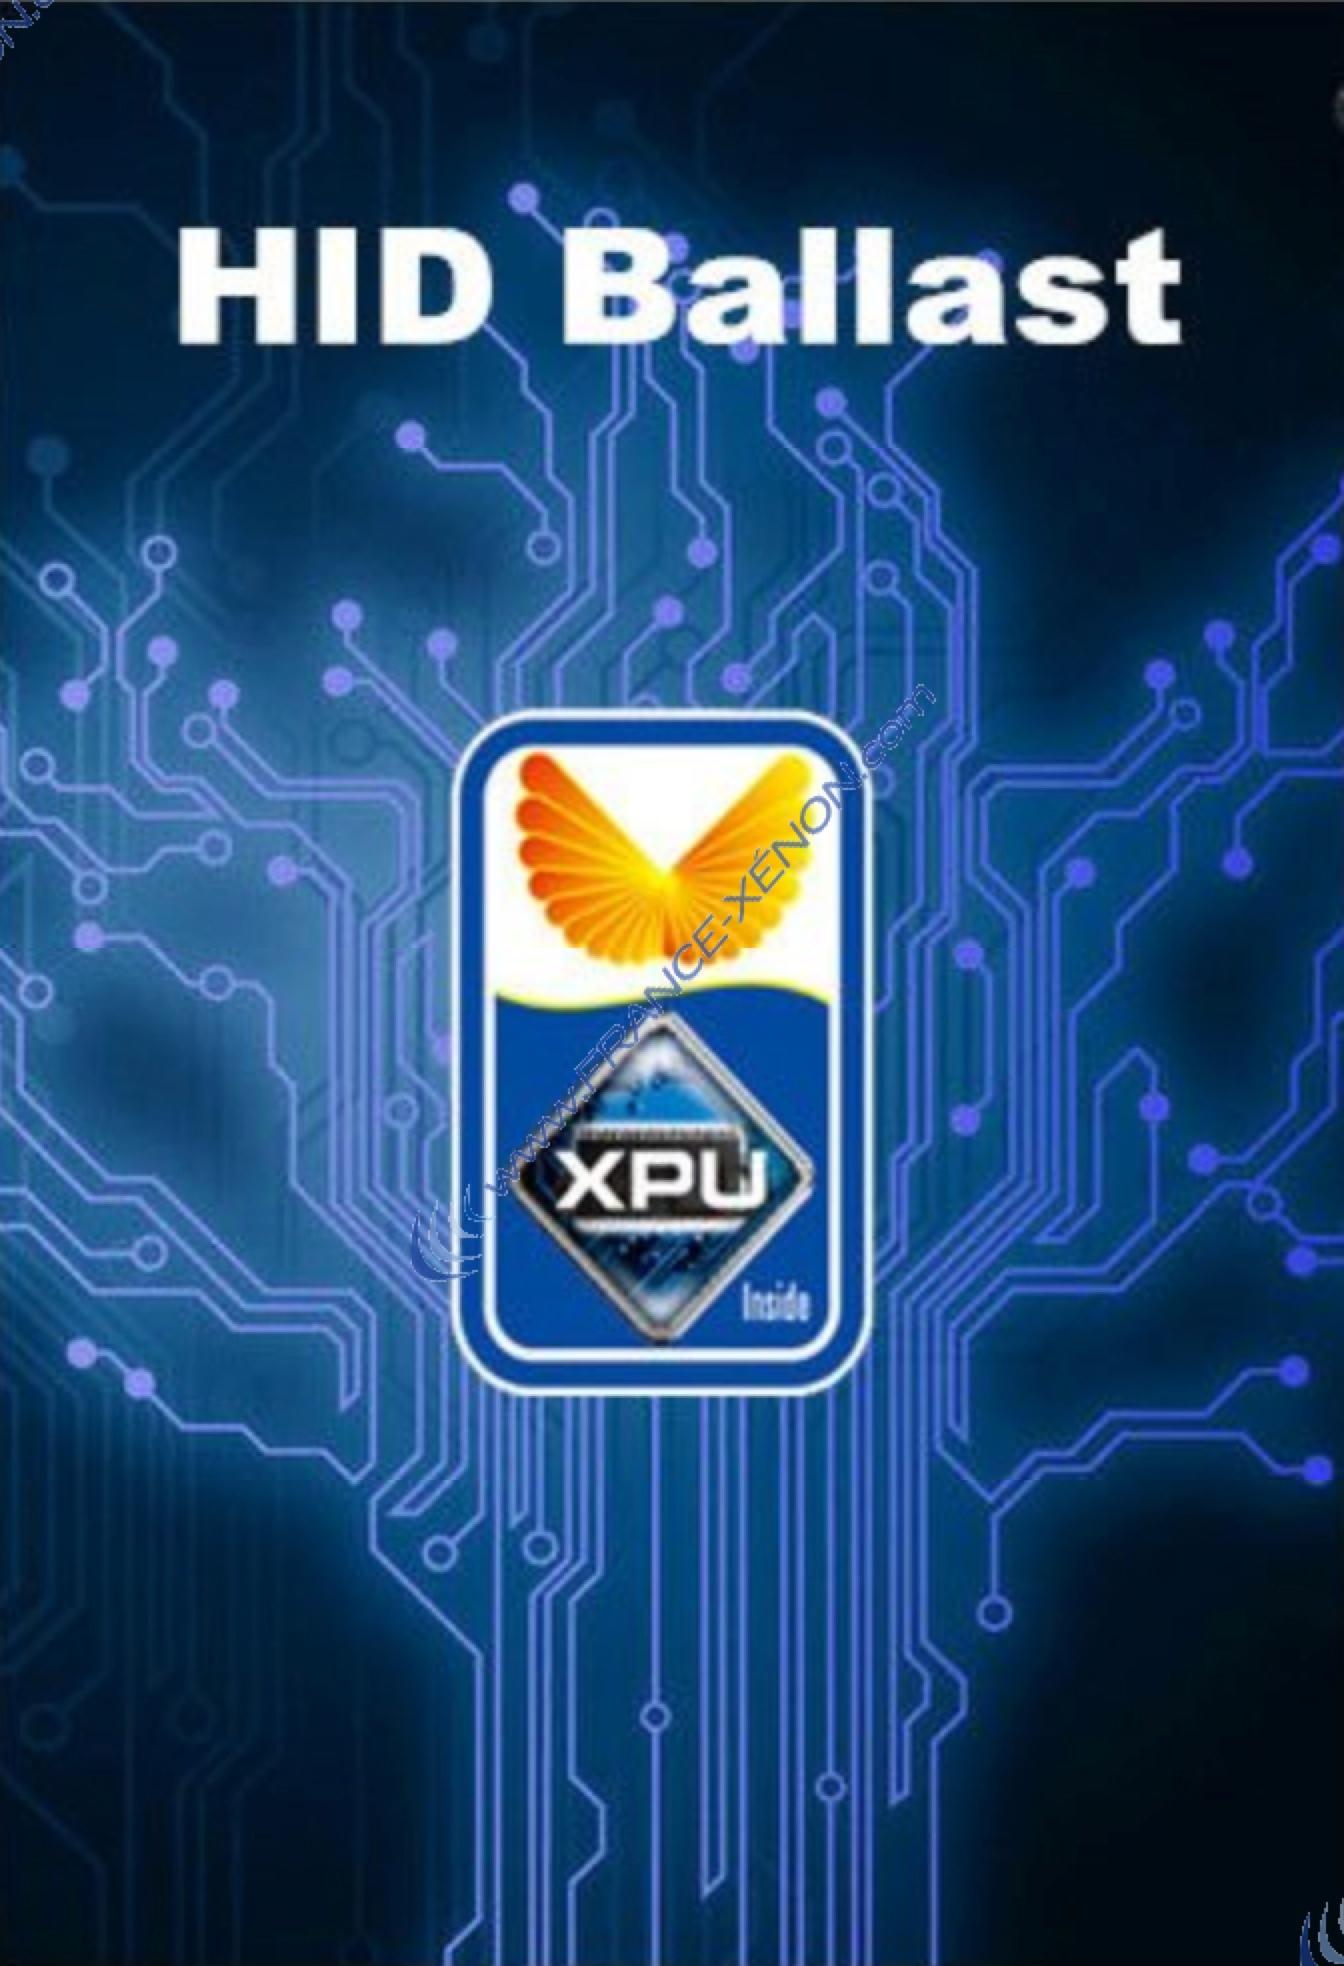 ballast XPU cnlight CANBUS PRO xenon france xenon haut de gamme